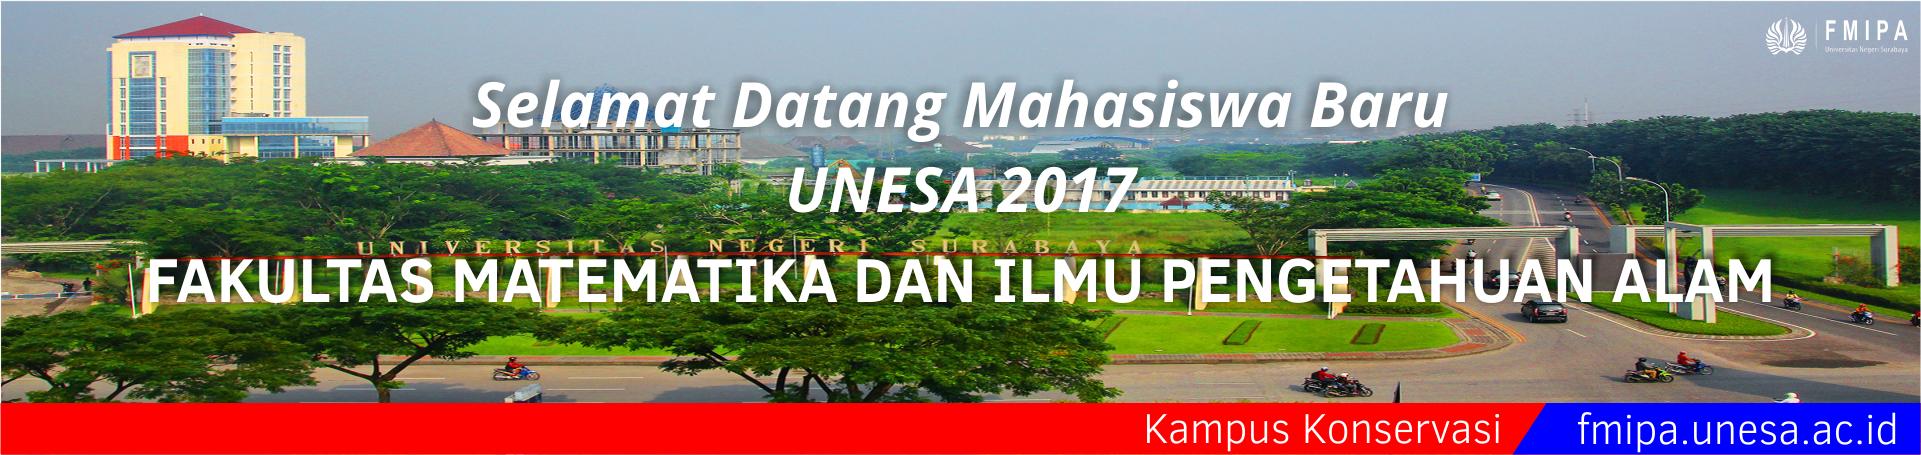 Banner-Slide-maba-2017